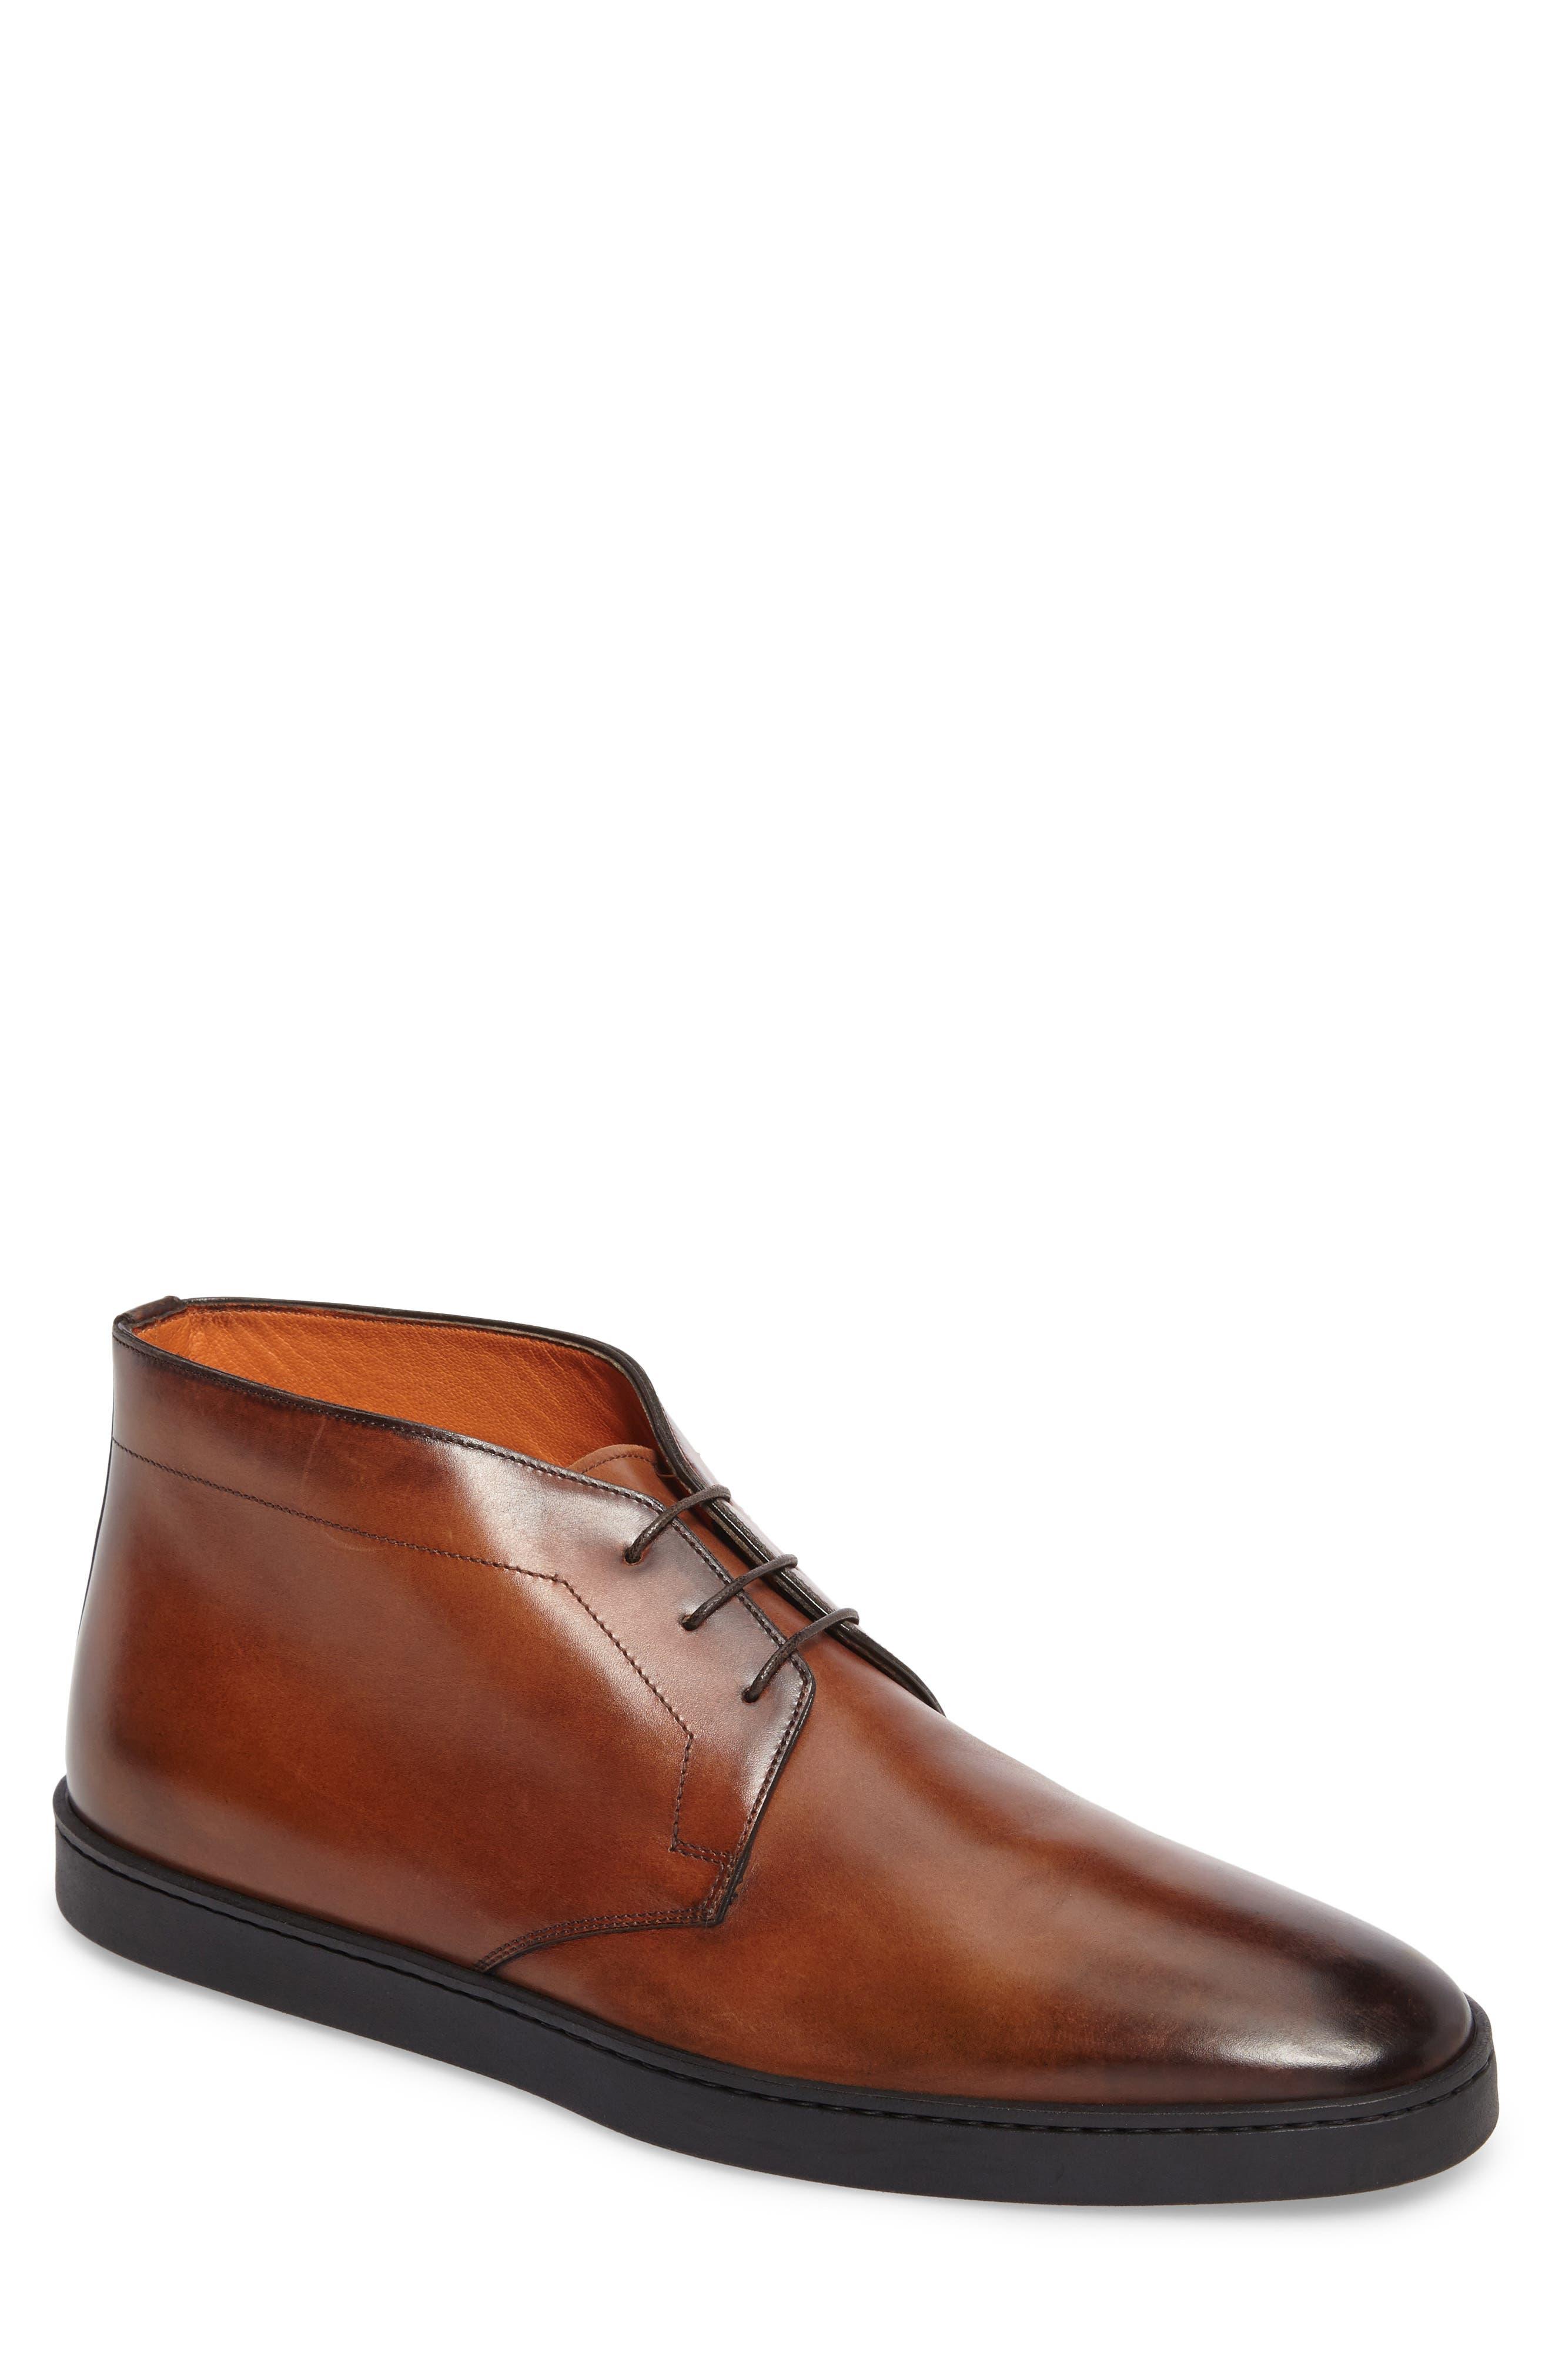 Eddy Chukka Sneaker Boot,                             Main thumbnail 1, color,                             BROWN